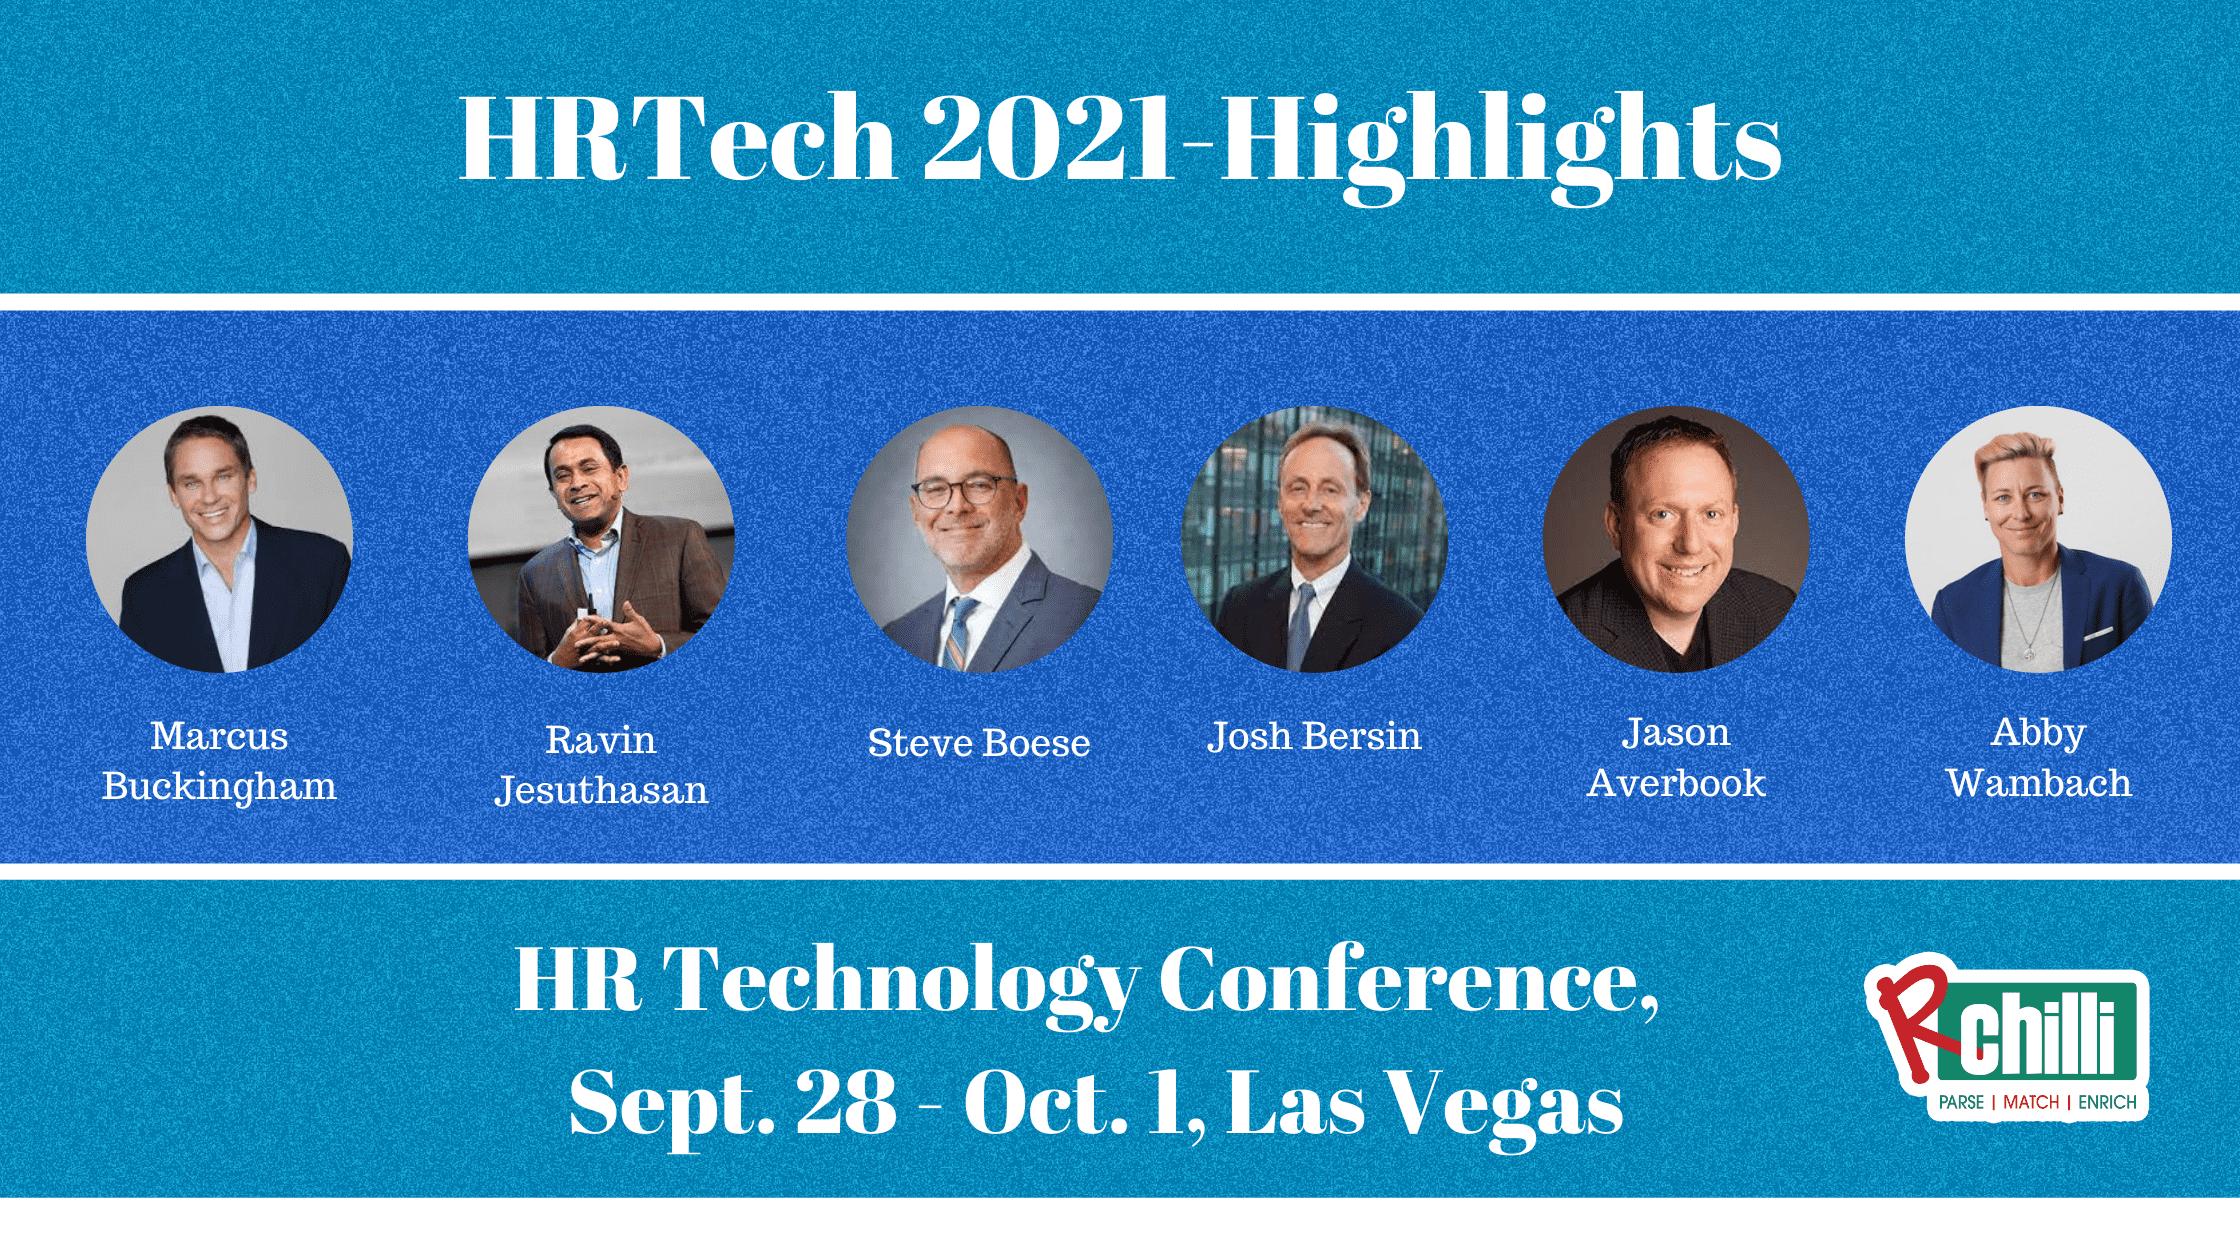 RChilli at HRTech Conference 2021